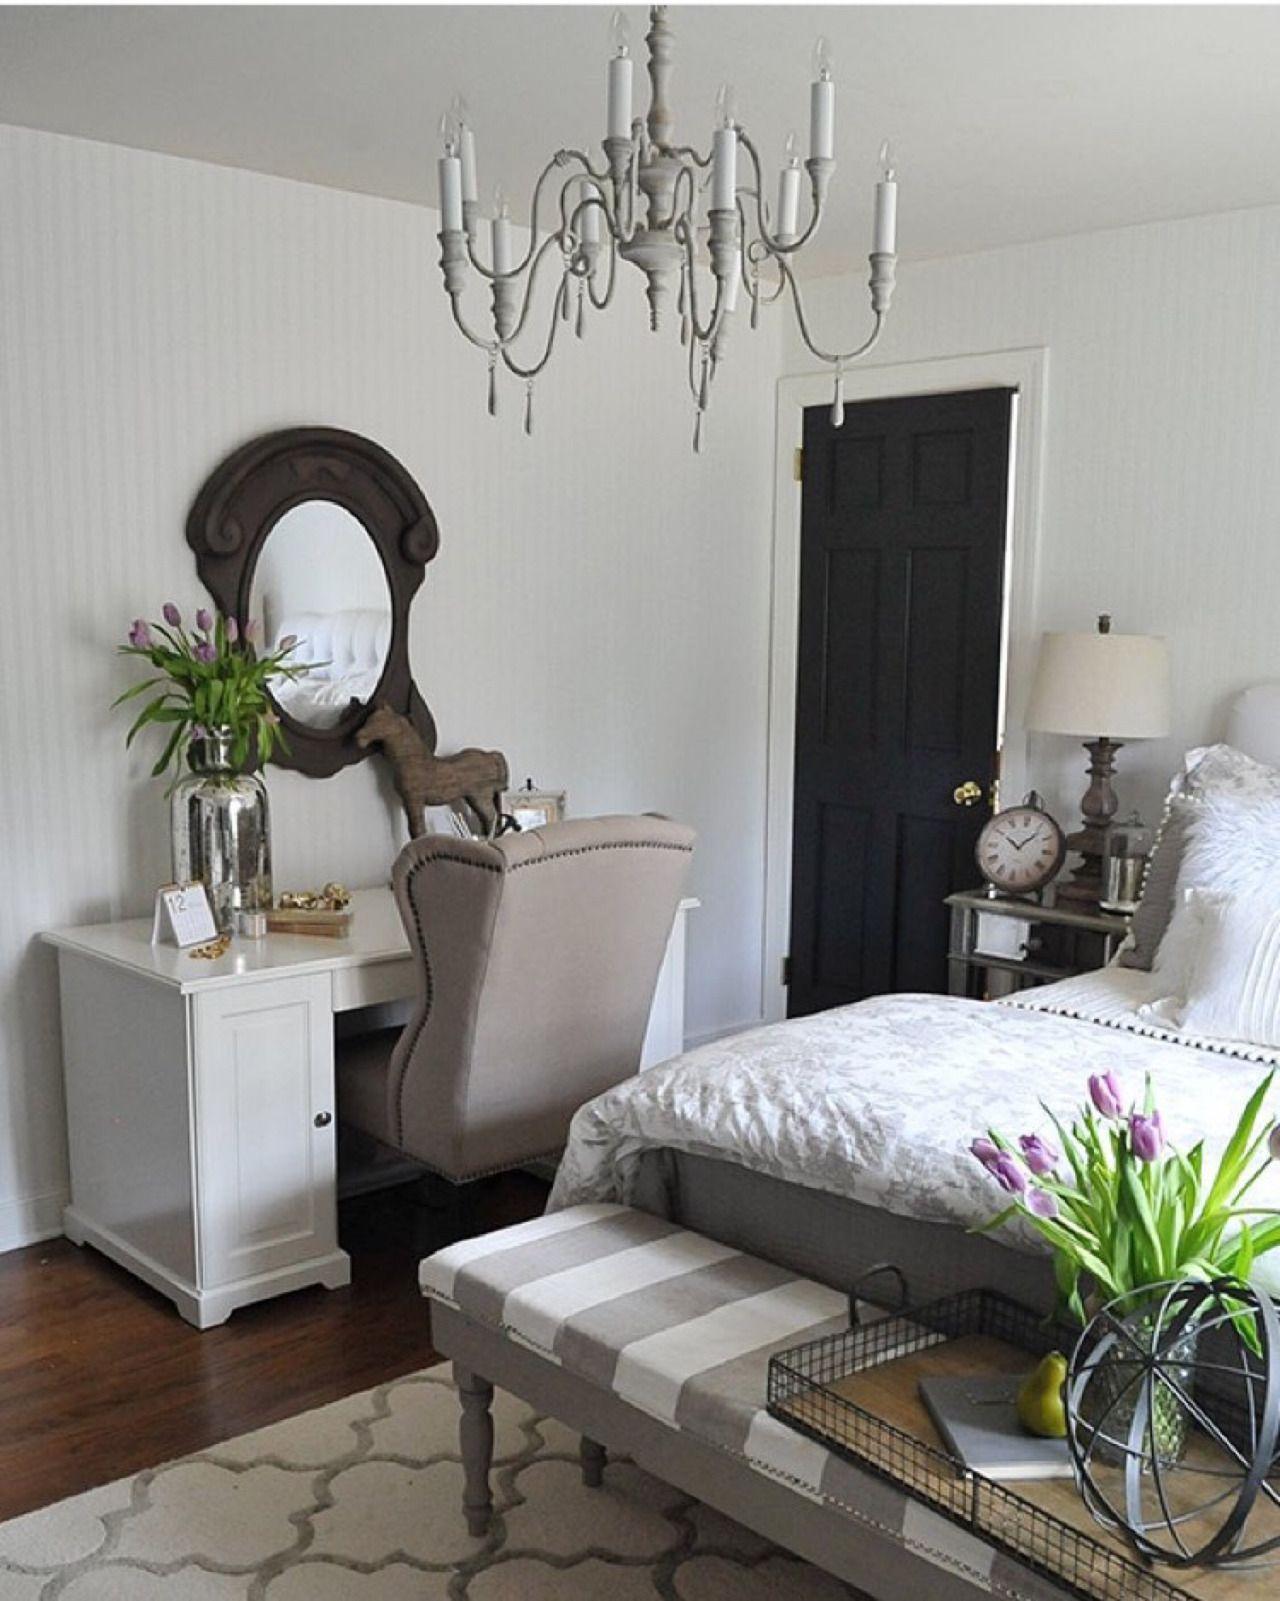 Master bedroom nook  Cottage Life u Via dearlillie  Simple Bedroom Country Living